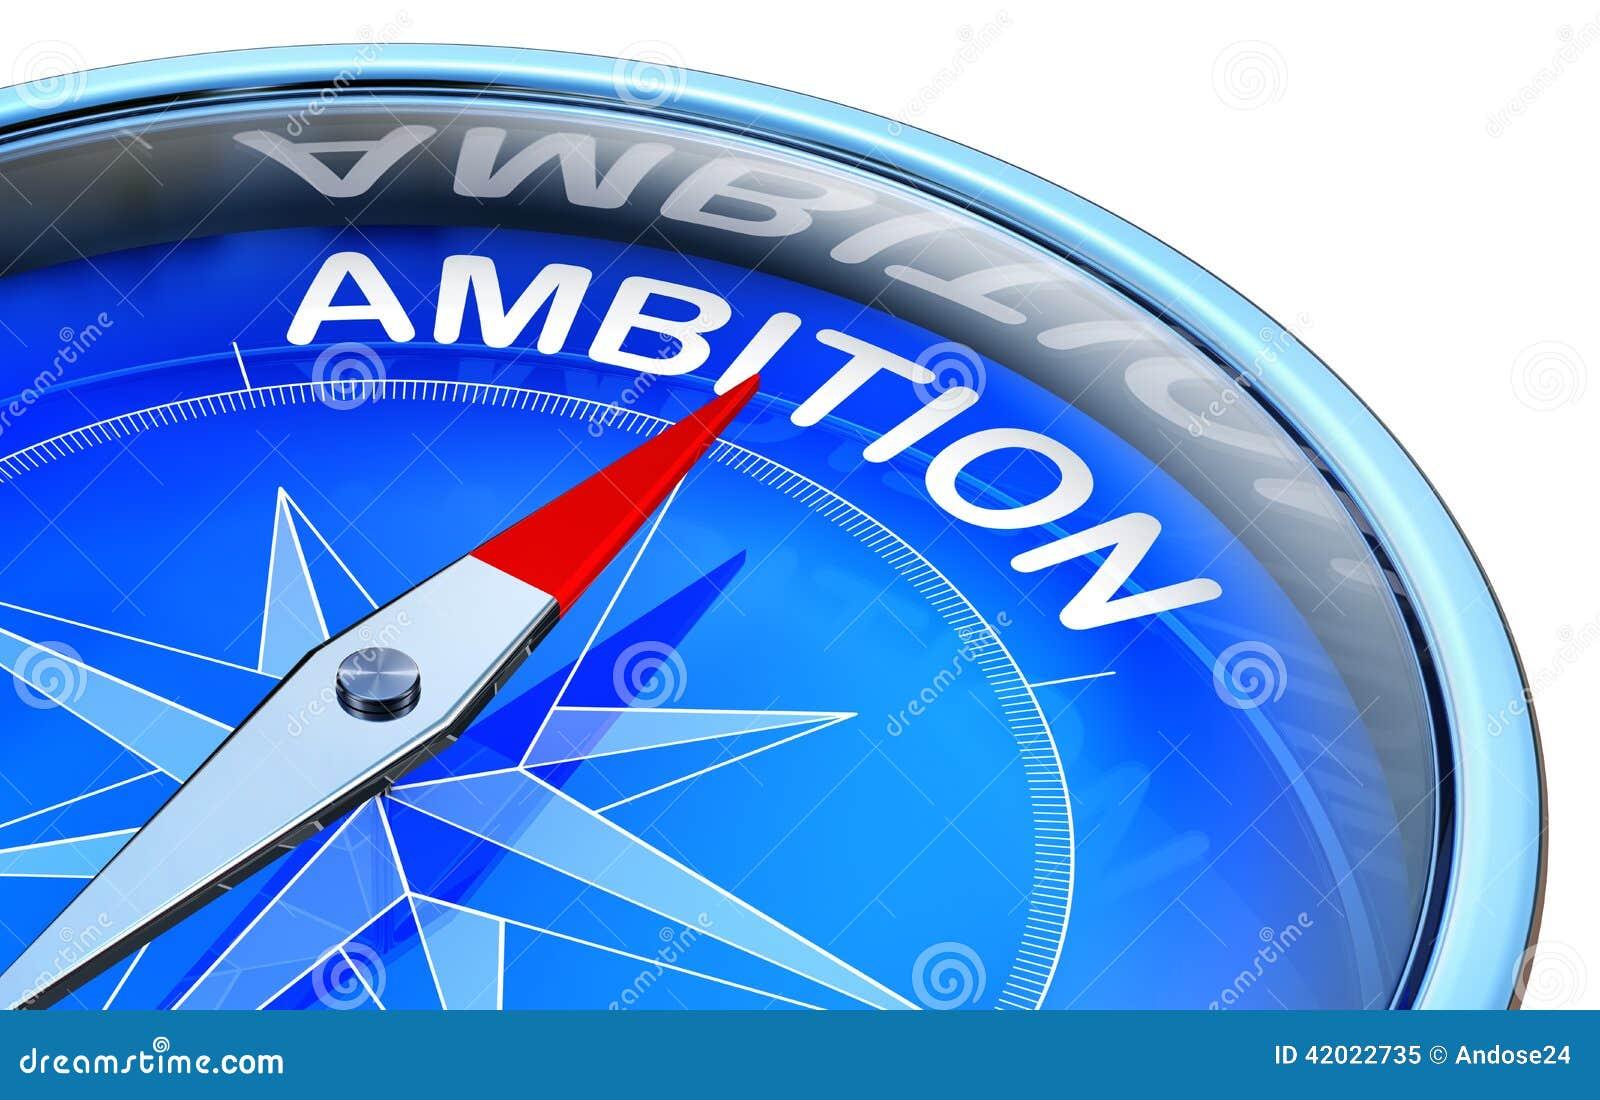 ambition stock illustration  image of ambition  planing